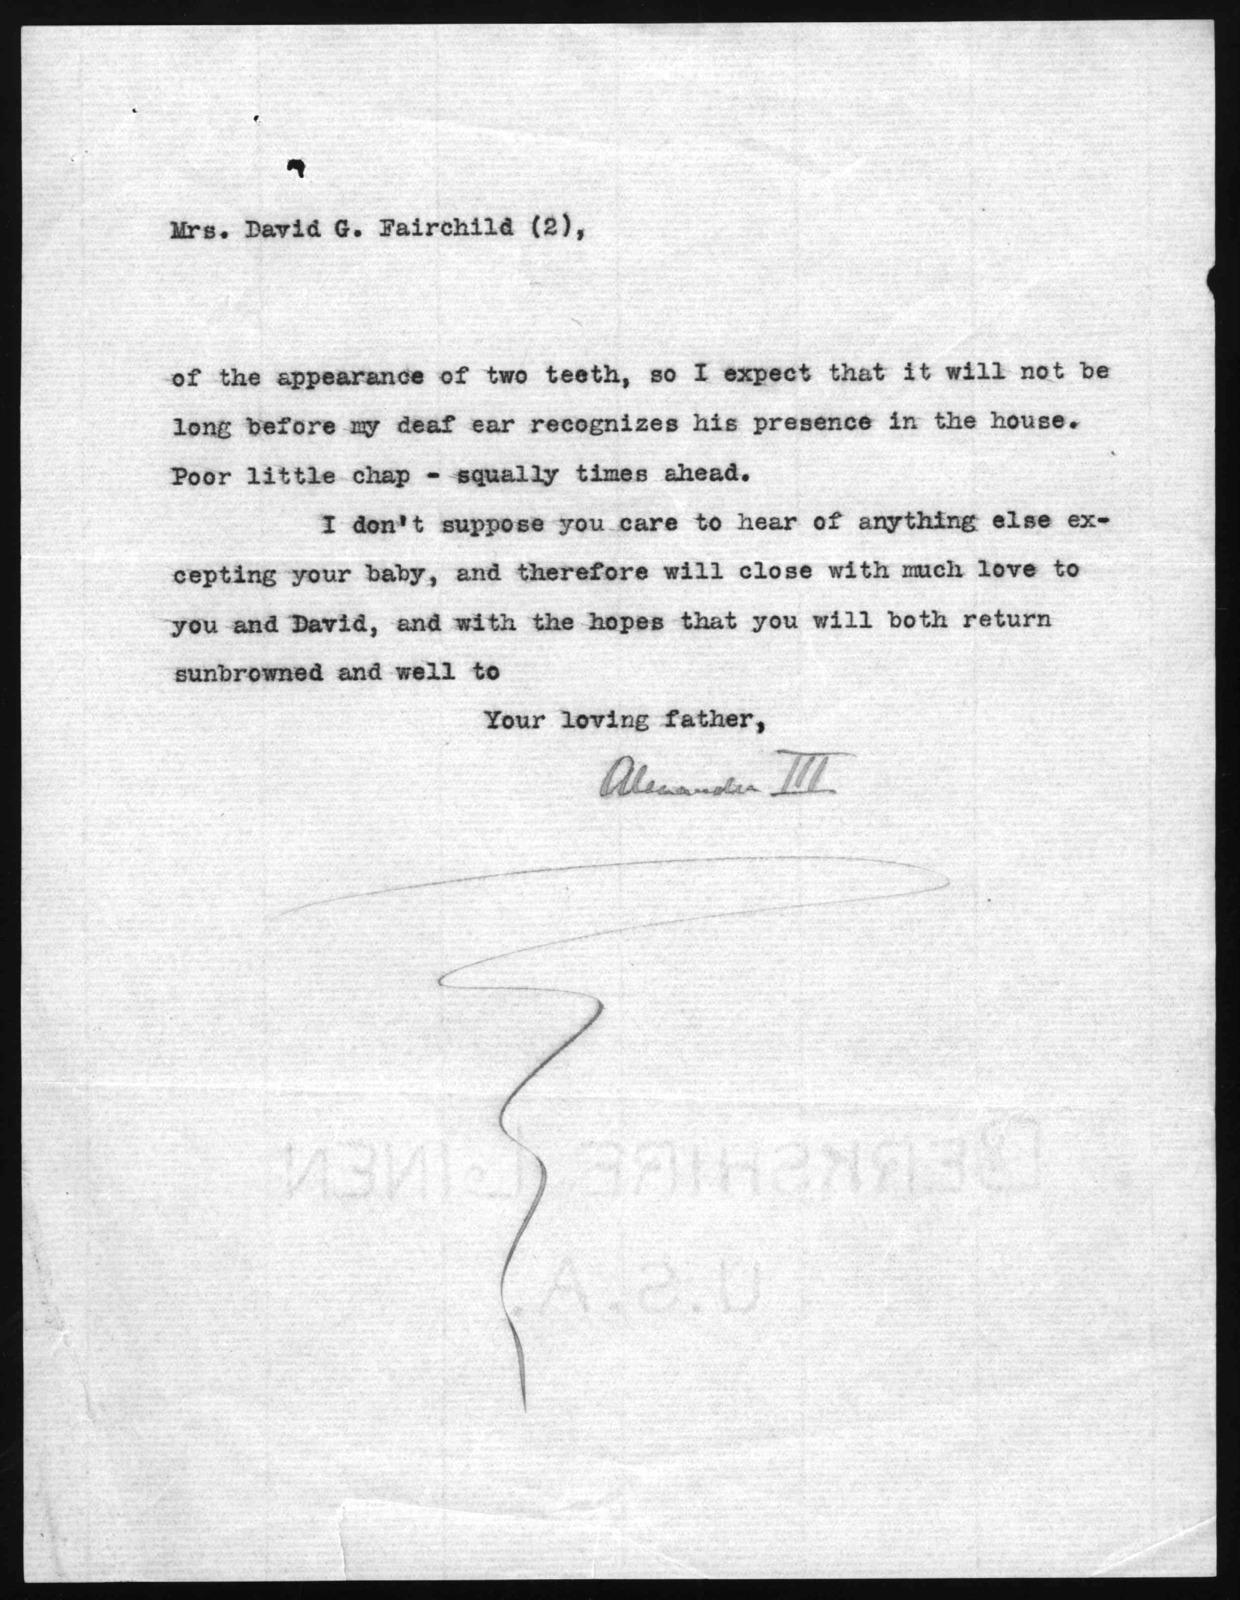 Letter from Alexander Graham Bell to Marian Bell Fairchild, March 1, 1907